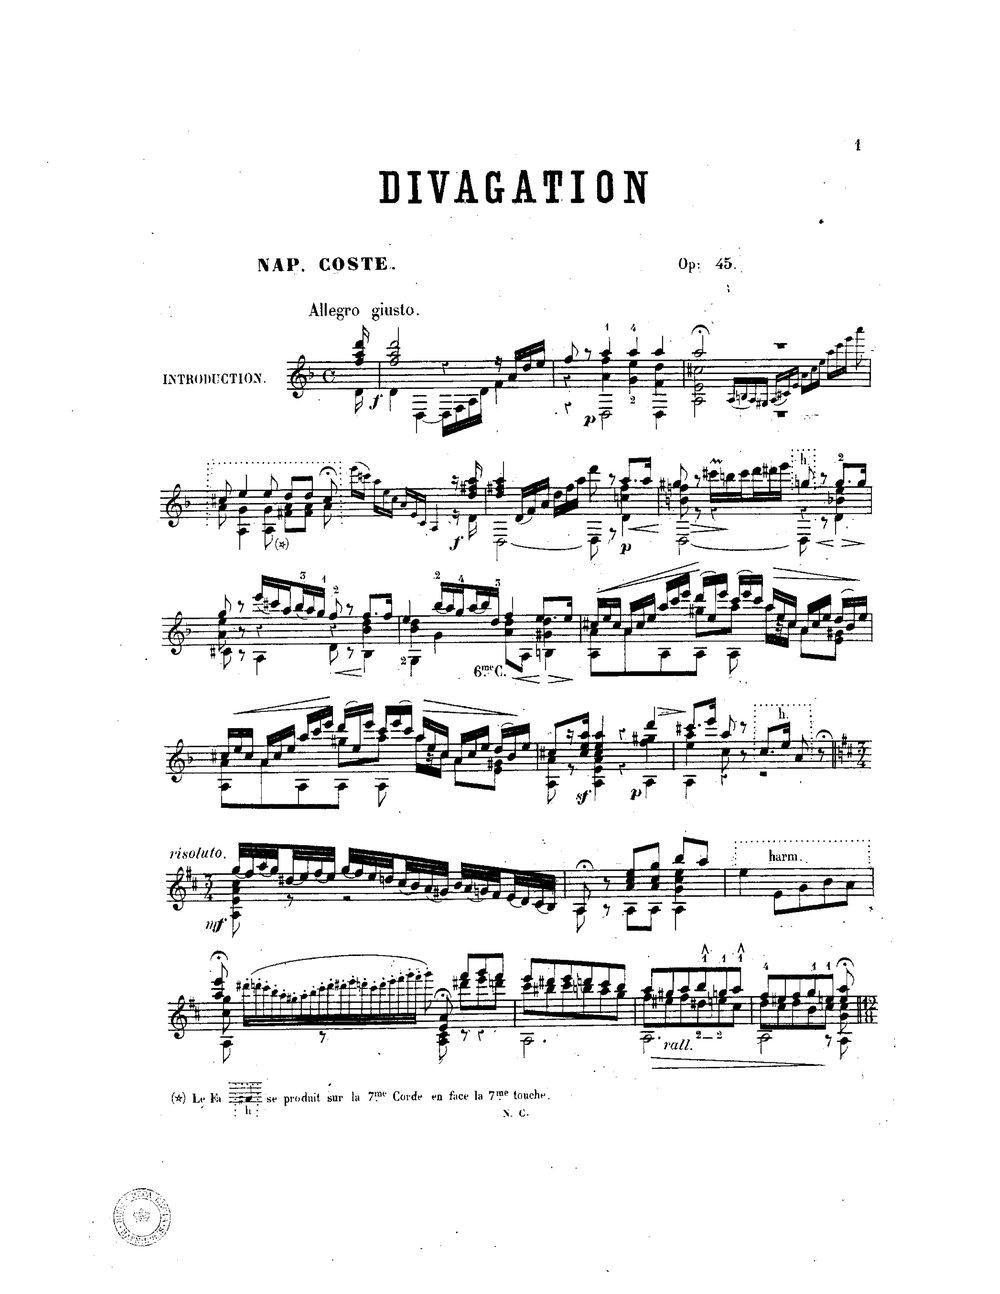 Coste - Divagation Op. 45 1.jpg